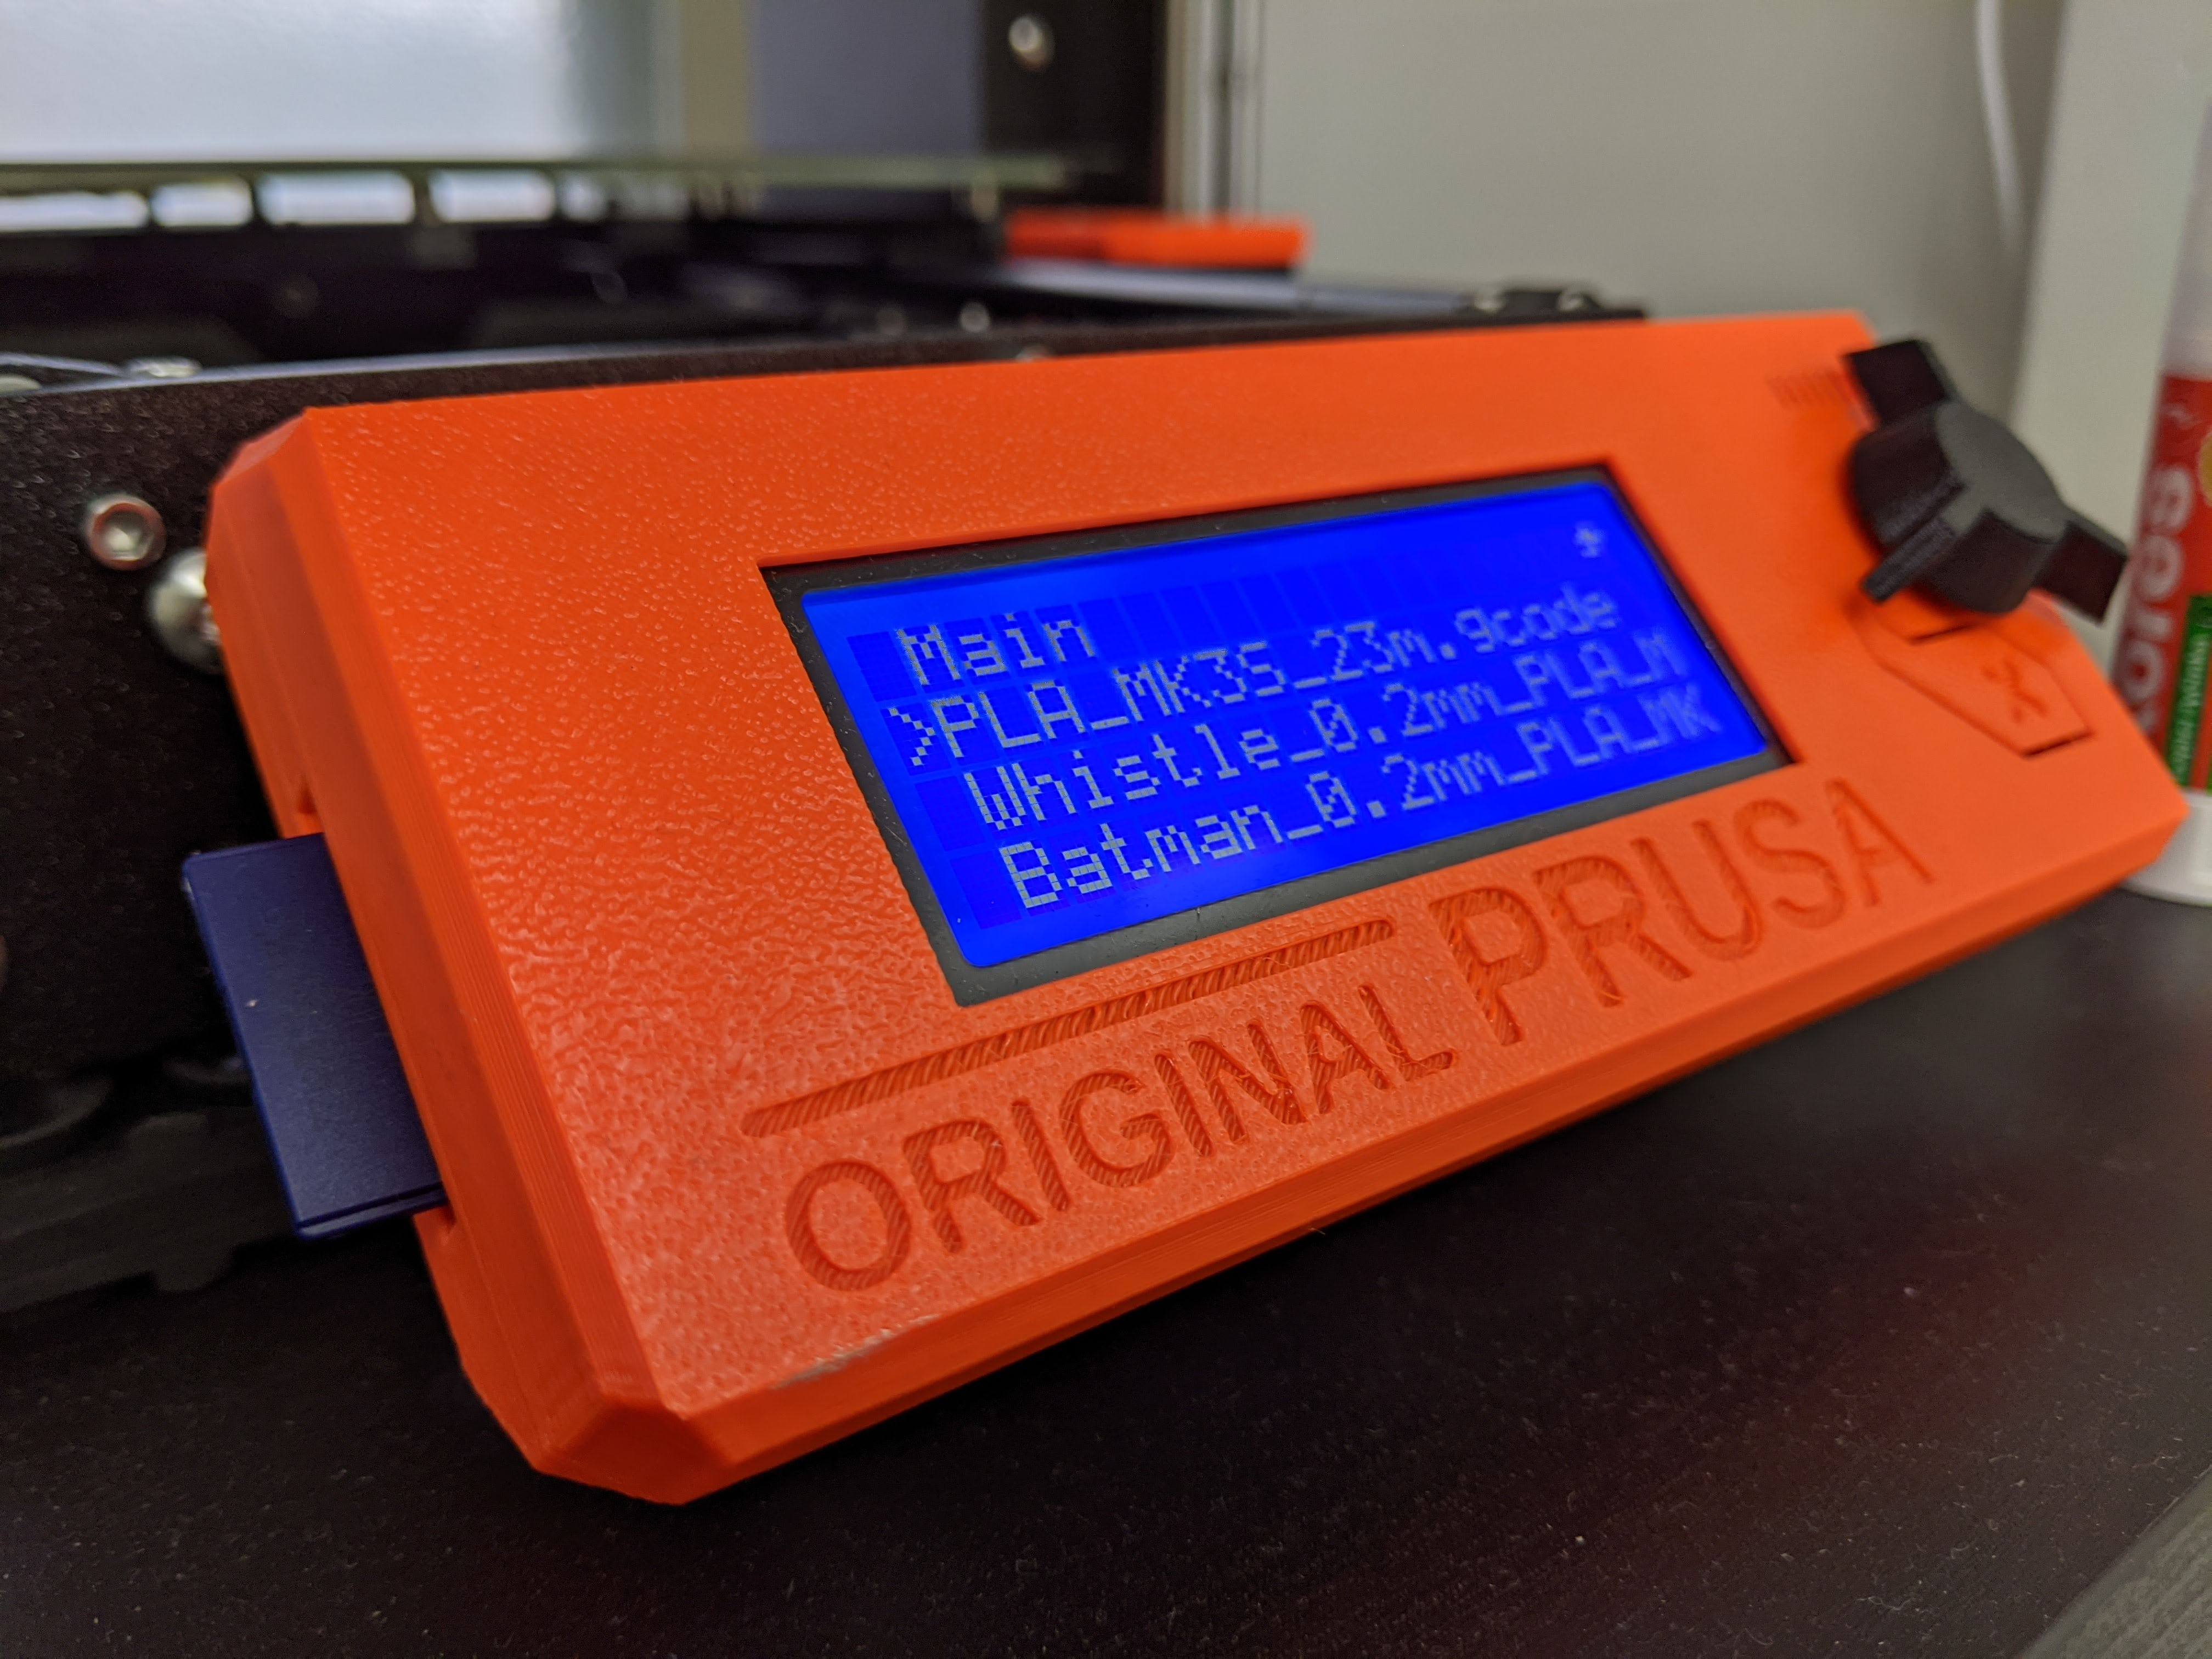 Prusa i3 SD card